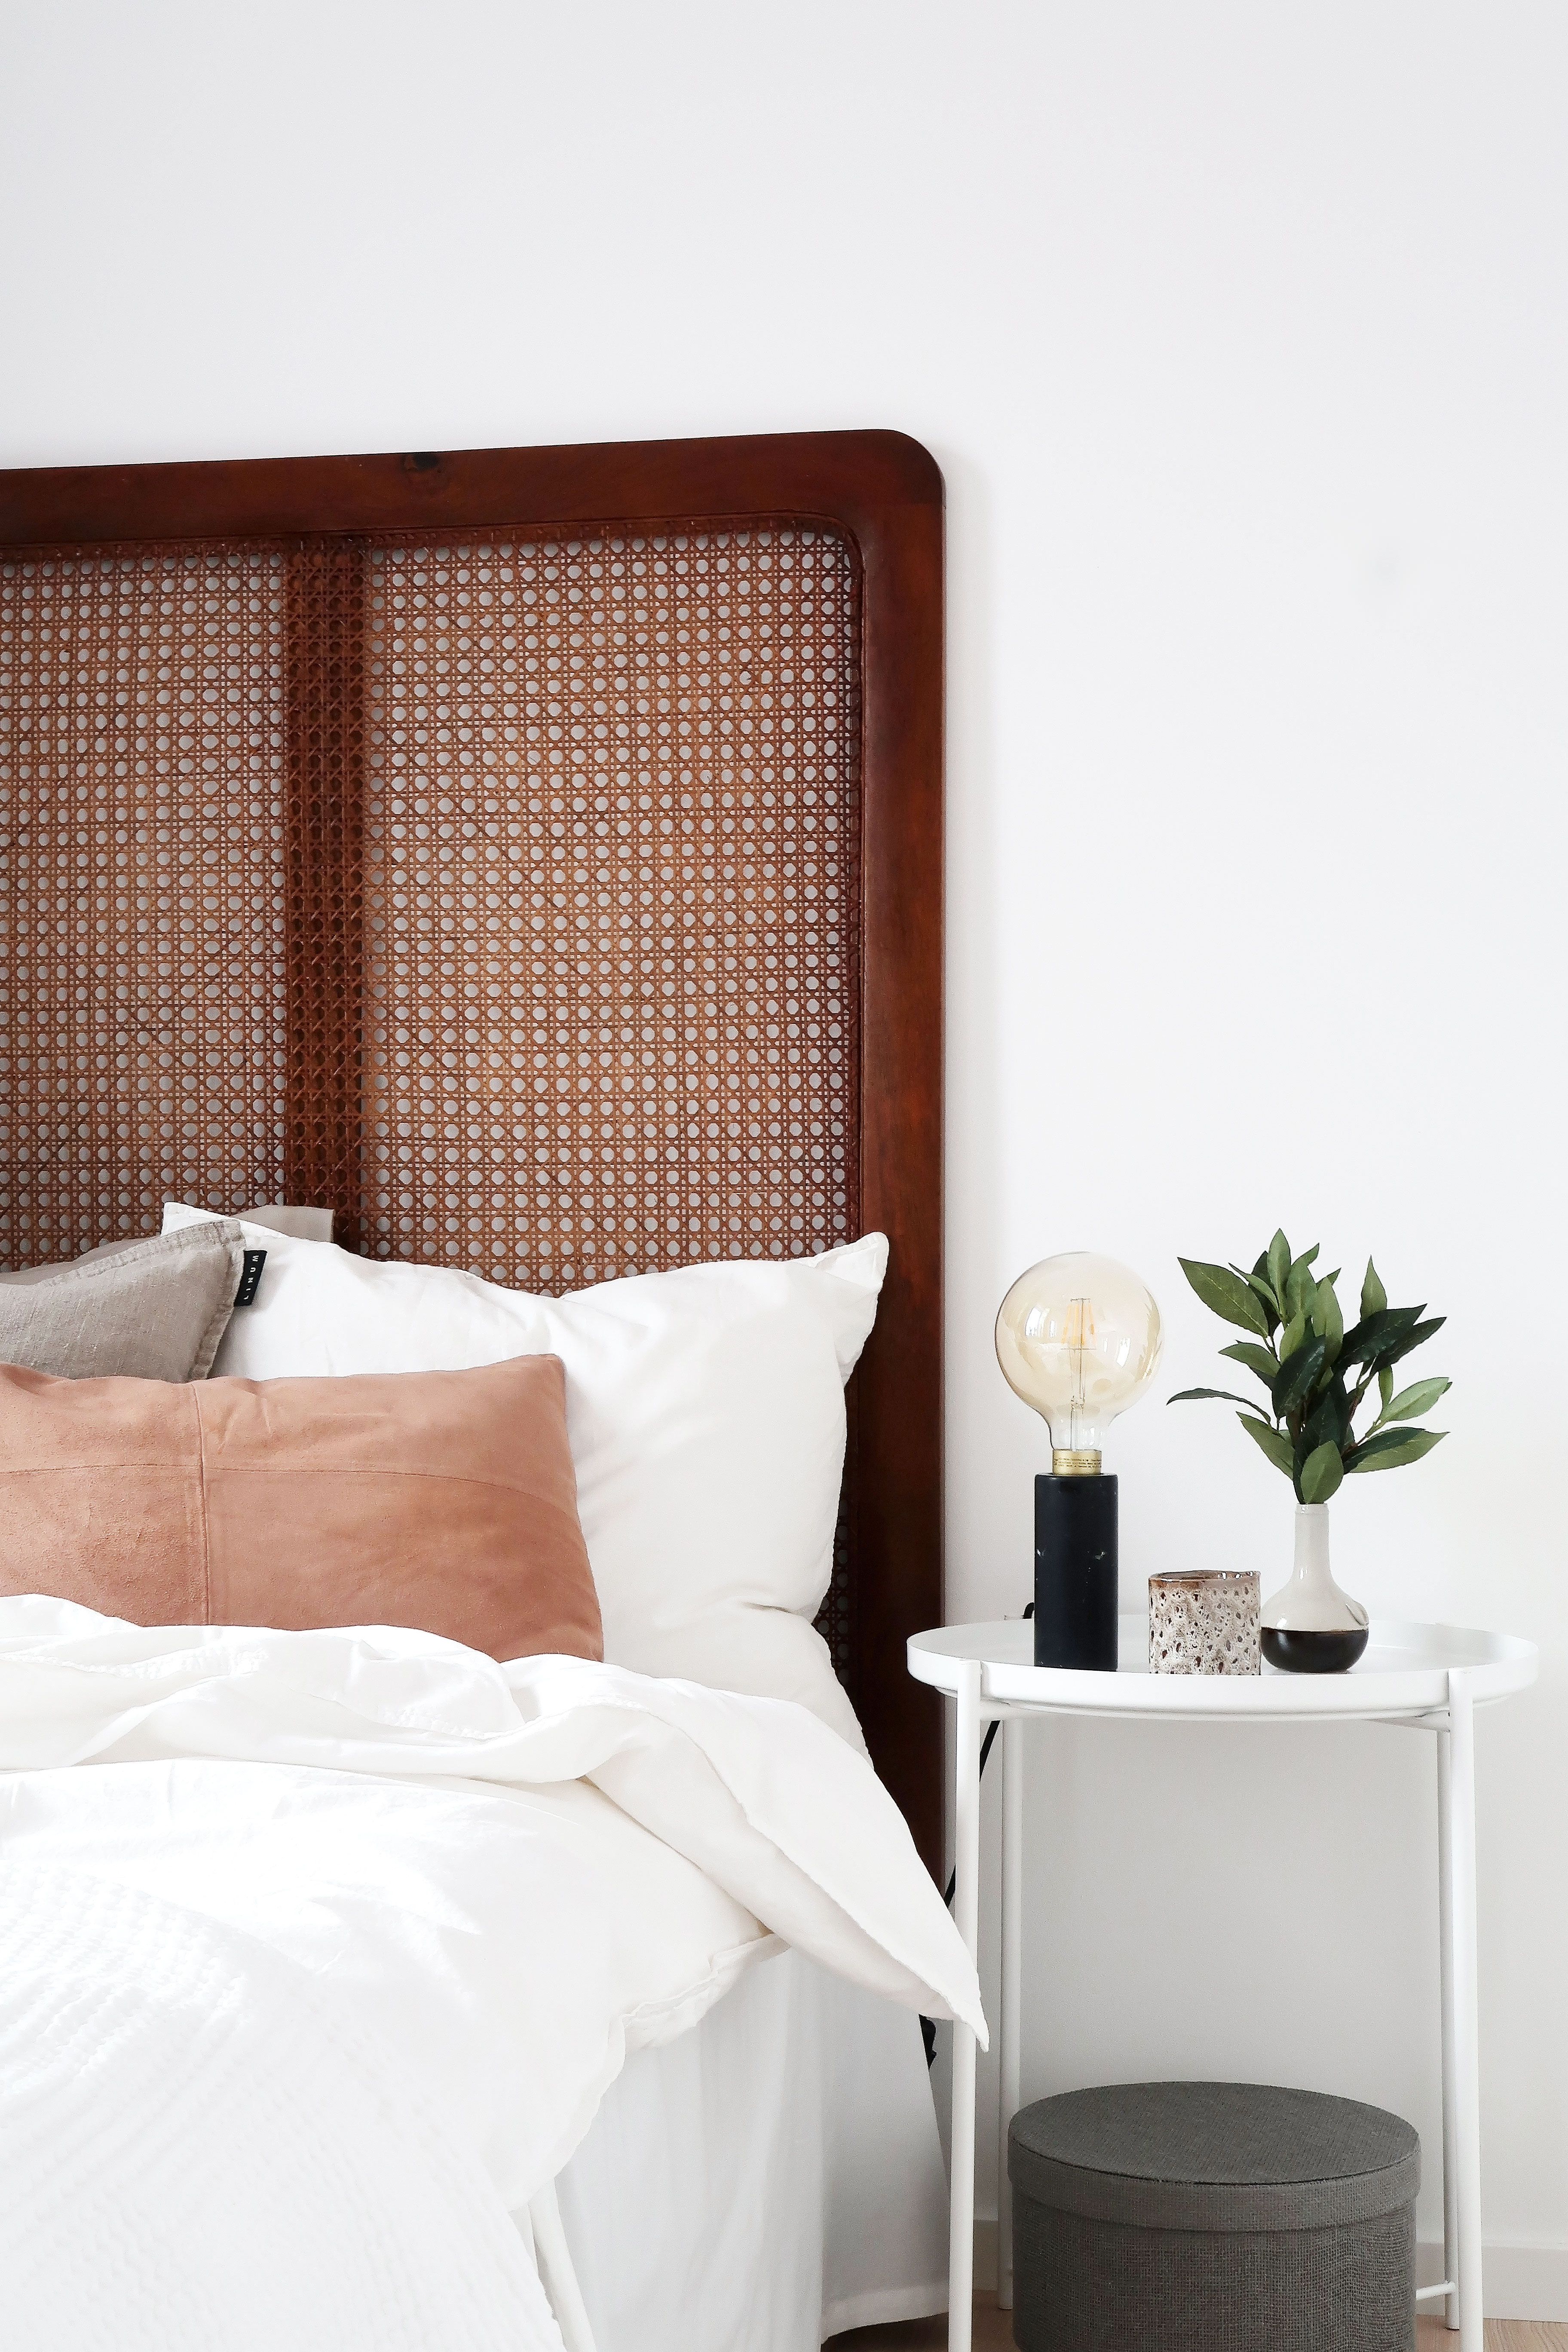 JM-slussen-sovrum-bedroom-interior-5